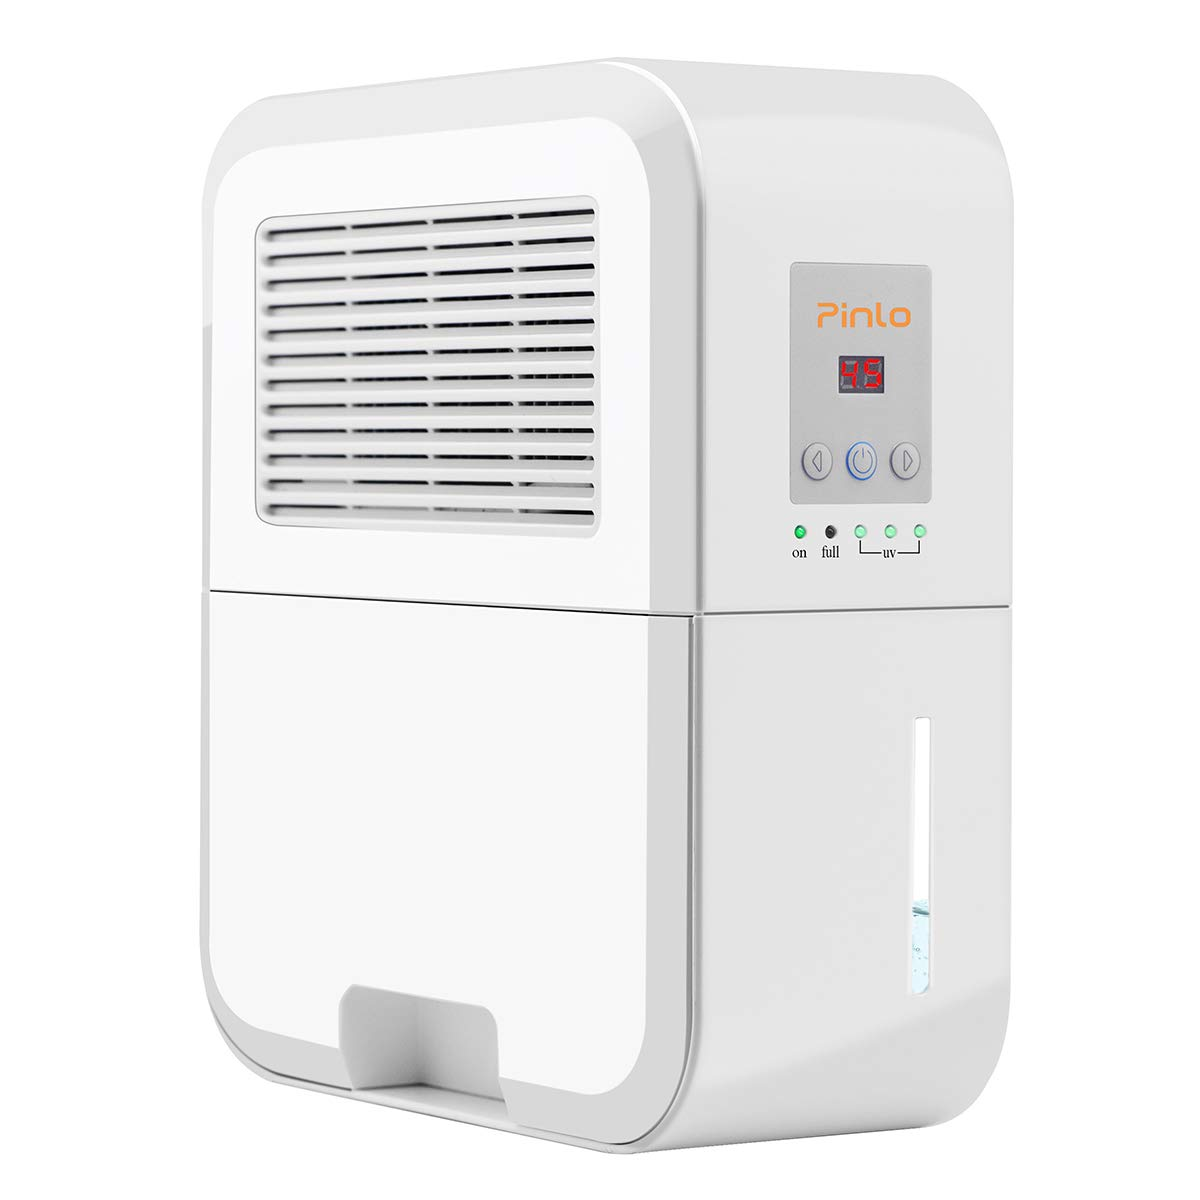 Dehumidifier Electric Mini Dehumidifiers for Home Basements Bathroom Bedroom Closet Wardrobe RV 2200 Cubic Feet (269 sq.ft) Large 2L Tank Smart Control Dehumidifier by pinlo